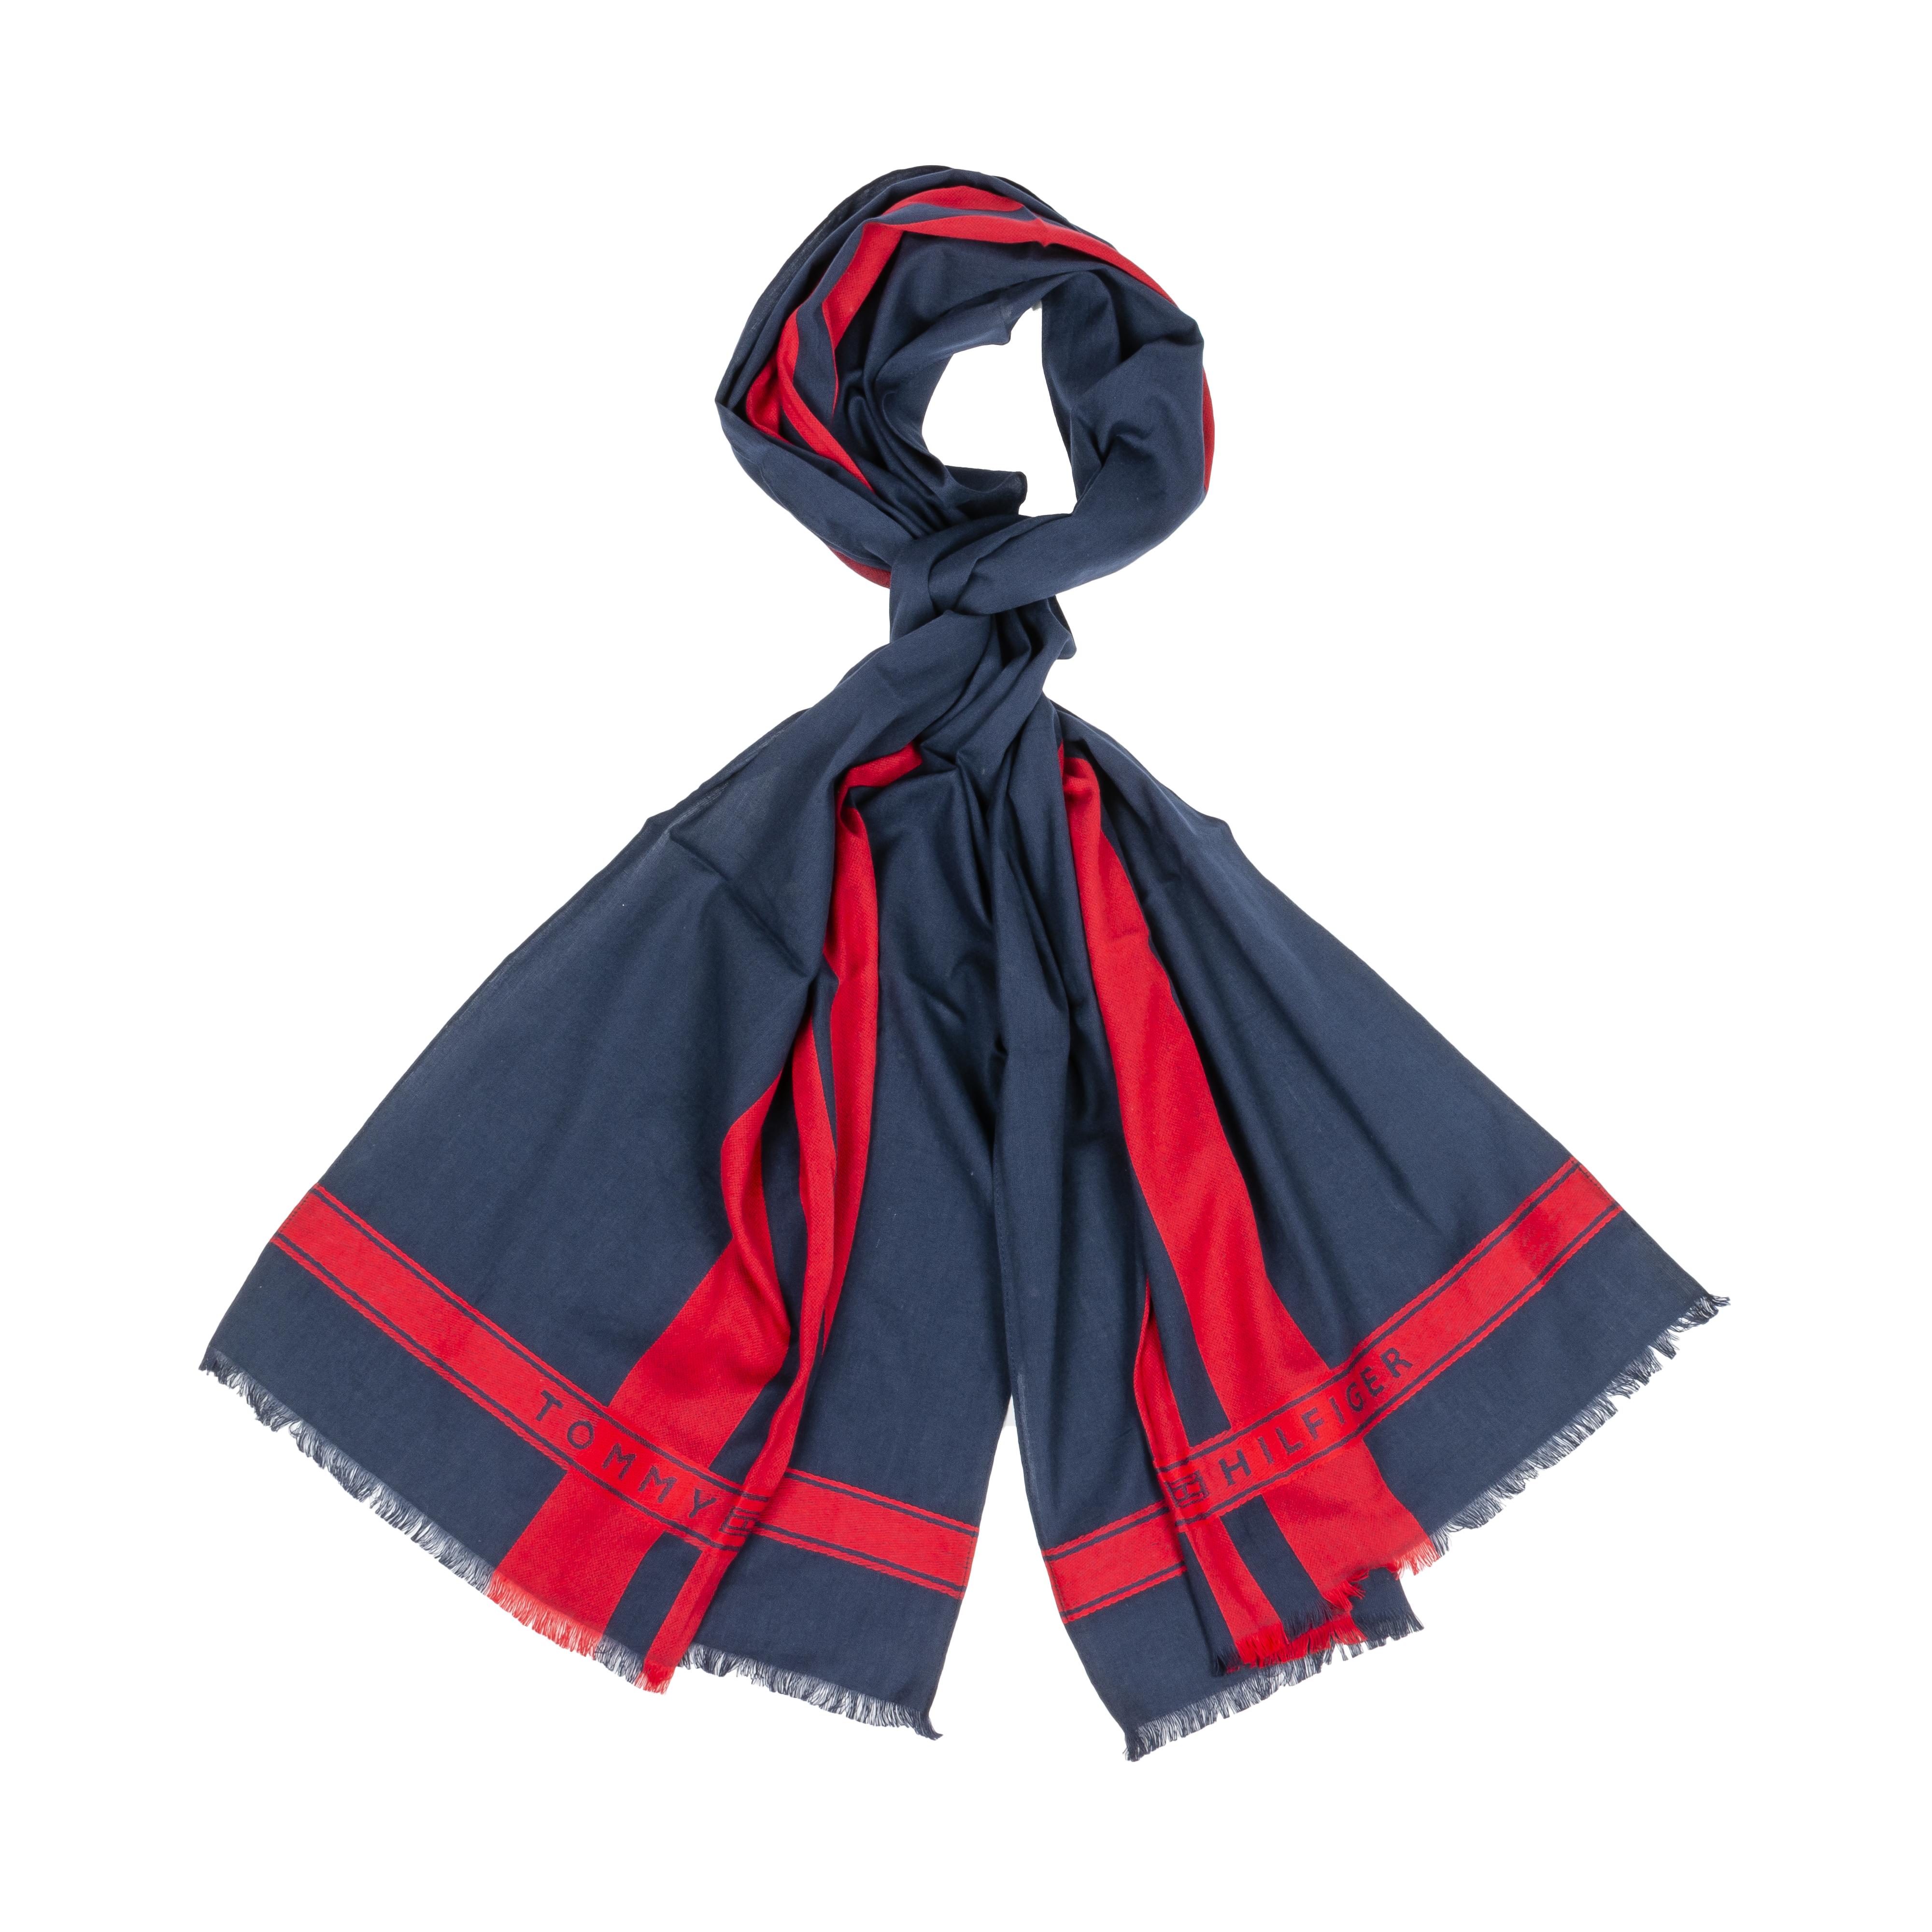 Foulard tommy hilfiger en coton bleu marine à bandes rouges